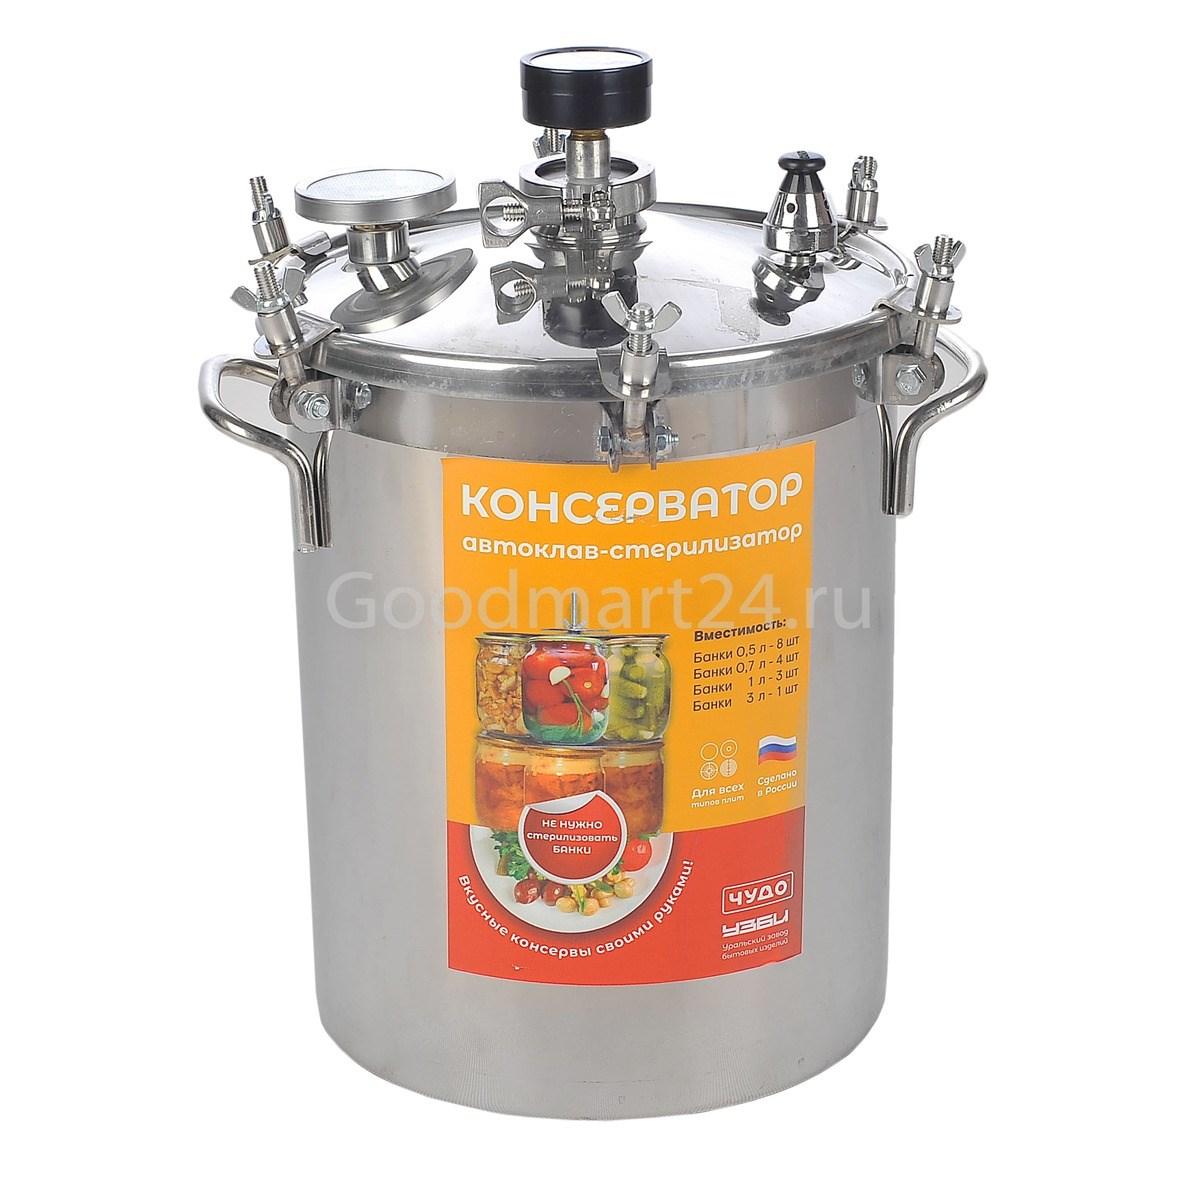 Автоклав Консерватор 14 л. нержавеющая сталь, термометр, манометр